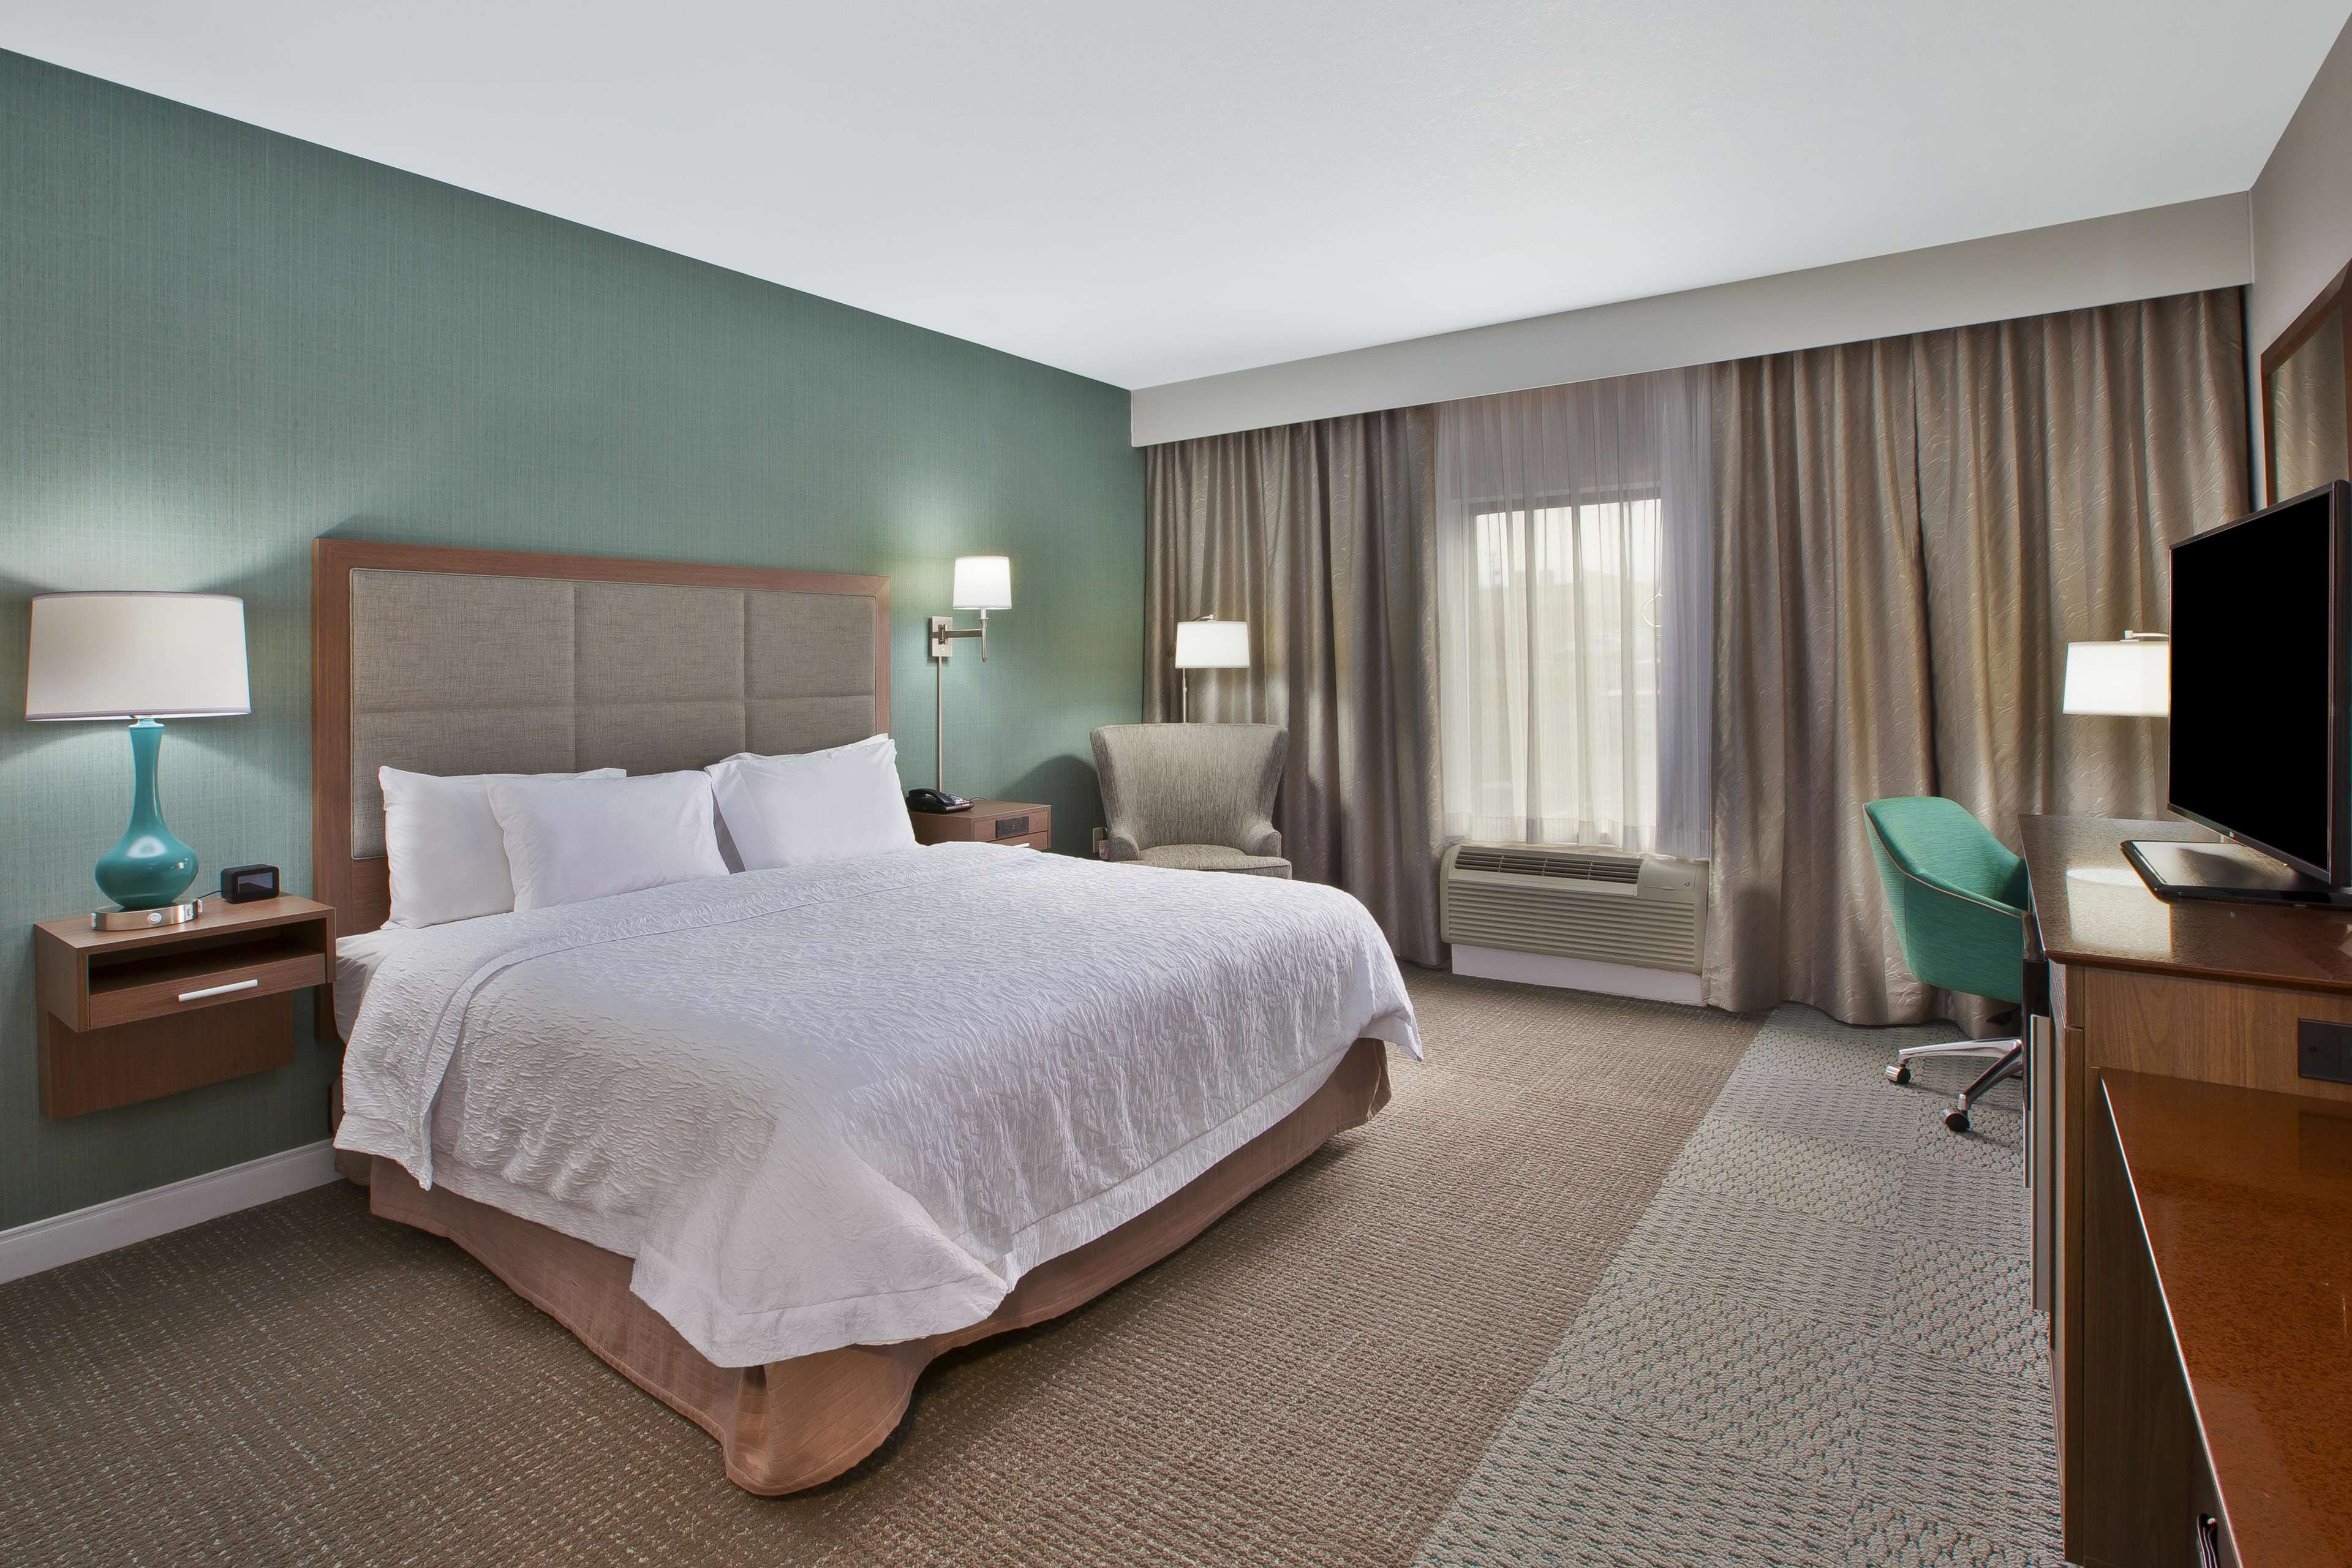 Hampton Inn & Suites Alliance image 10